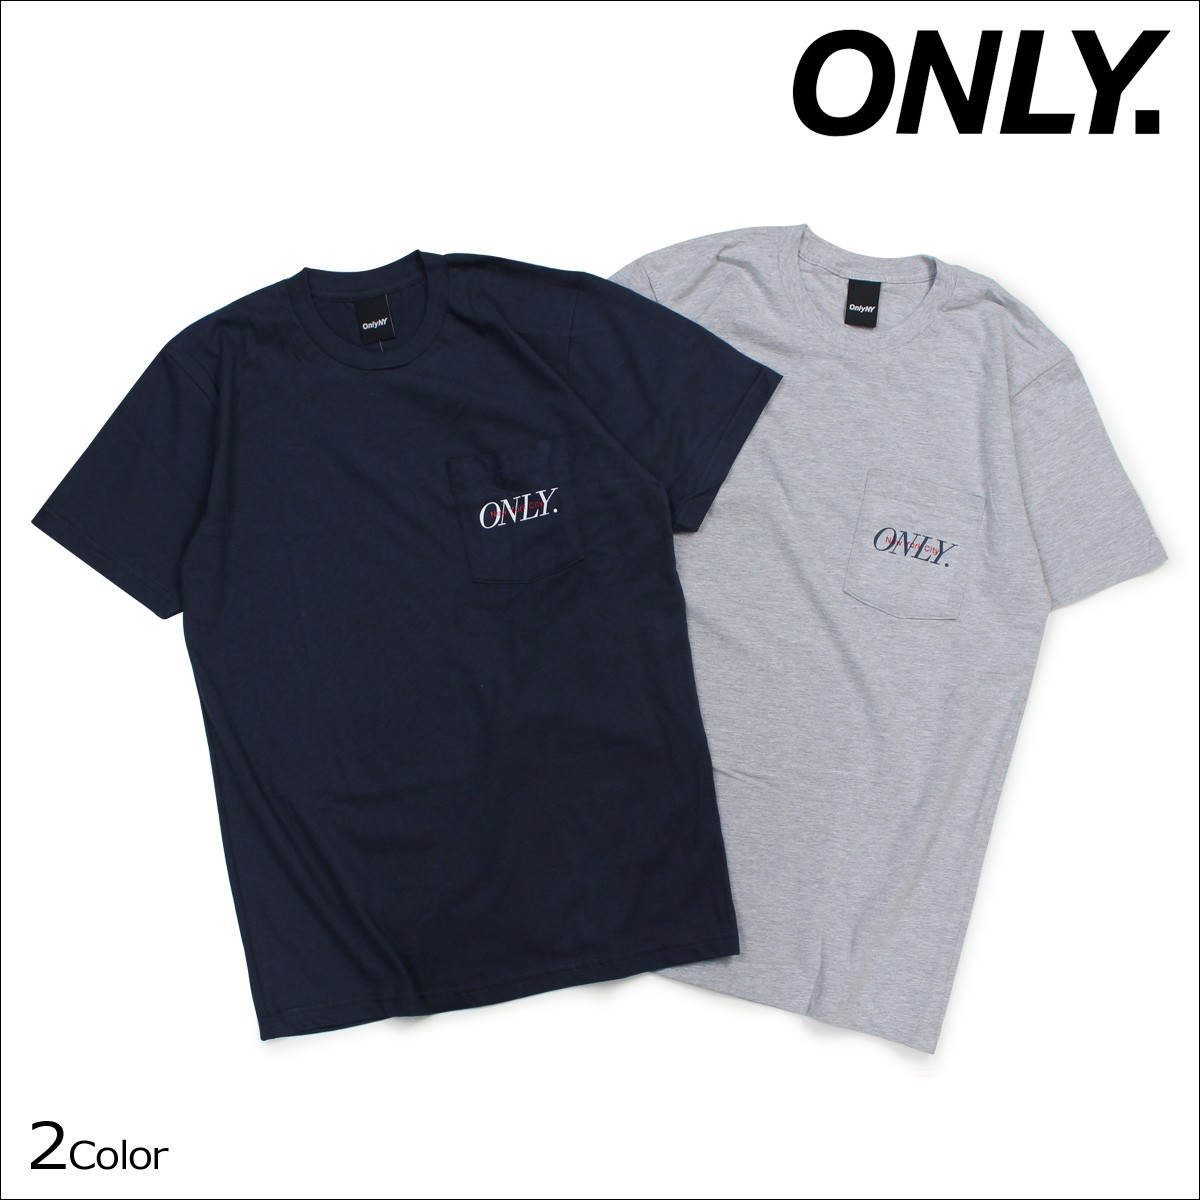 ONLY NY オンリーニューヨーク Tシャツ メンズ 半袖 トップス クルーネック MIDTOWN POCKET T-SHIRT 2カラー